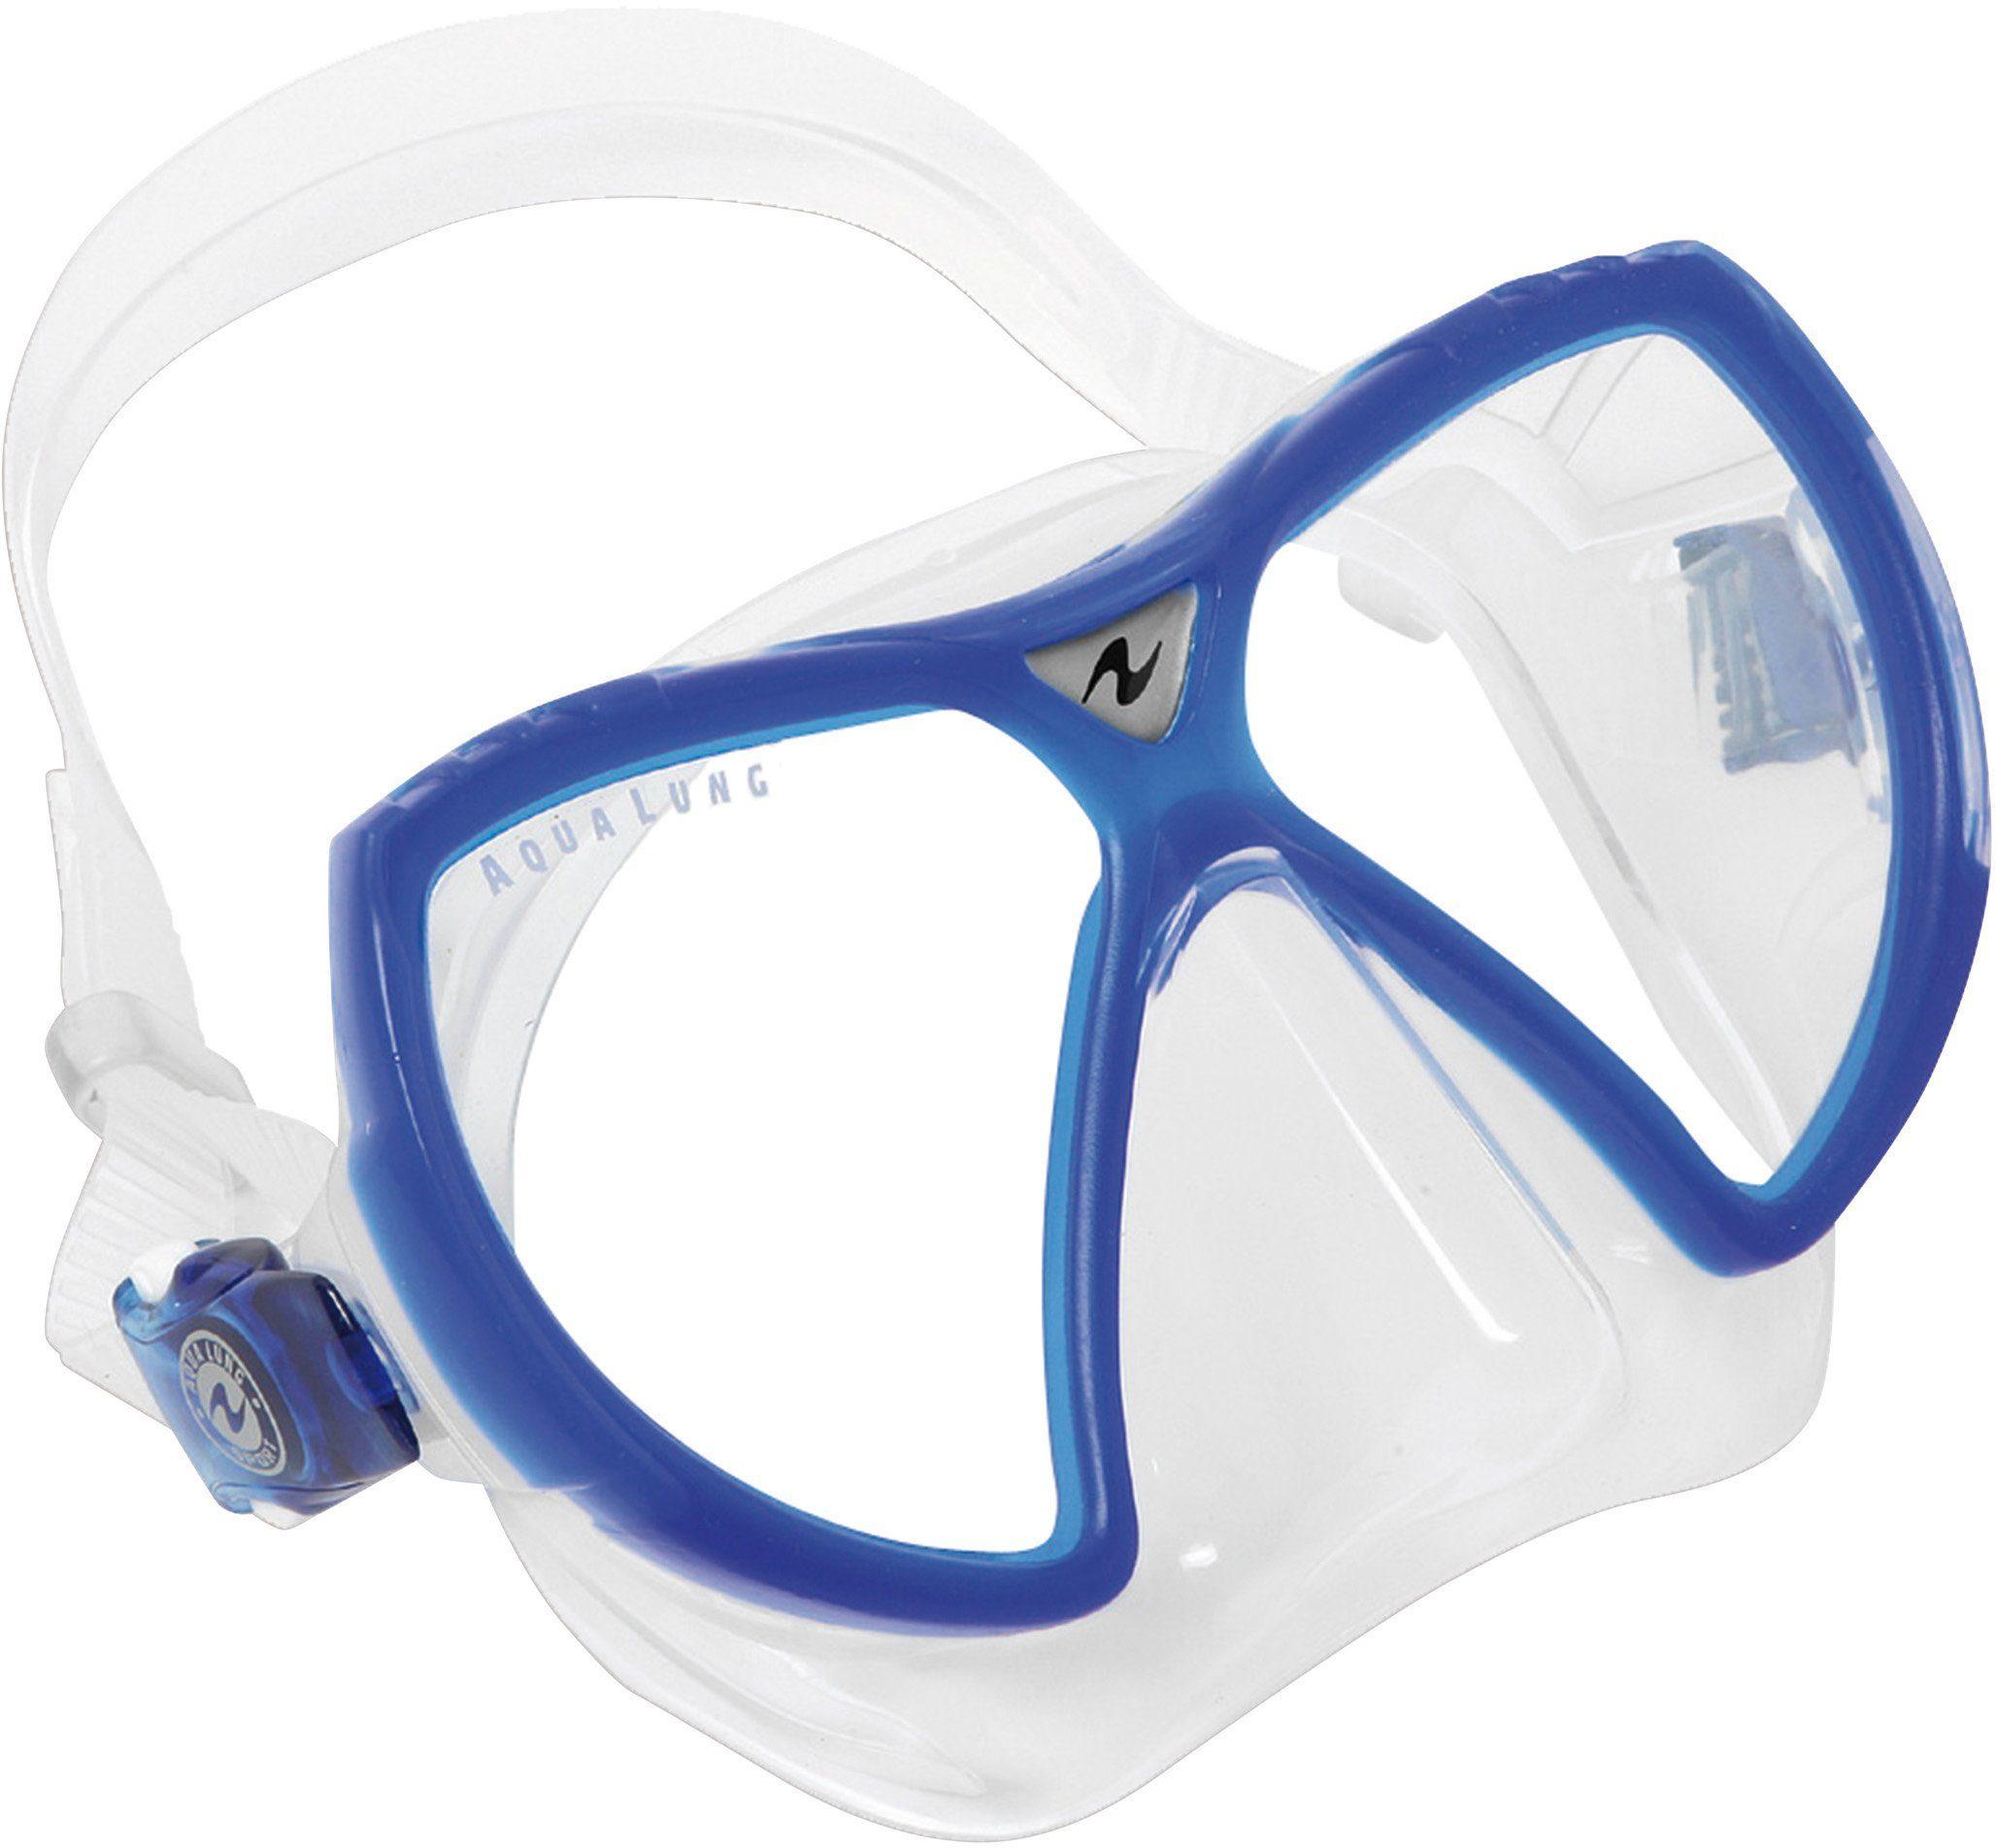 TAUCHMASKE, Aqua Lung Sport, »VISIONFLEX LX«